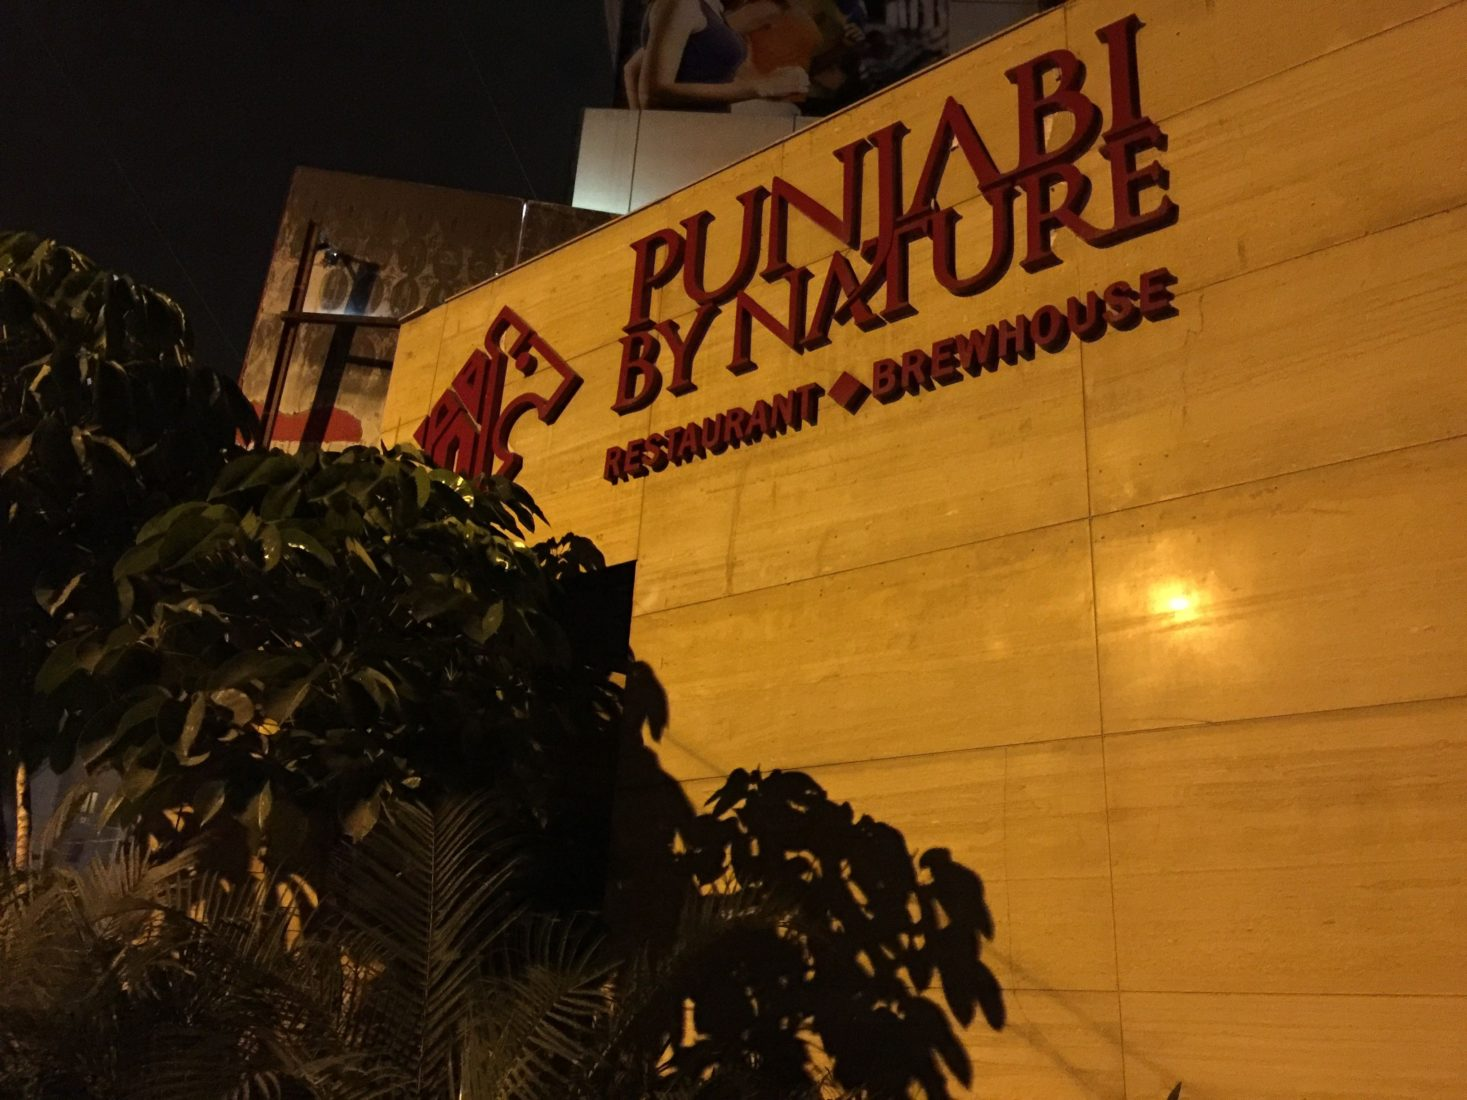 258. Punjabi by Nature, Bangalore India, 2015